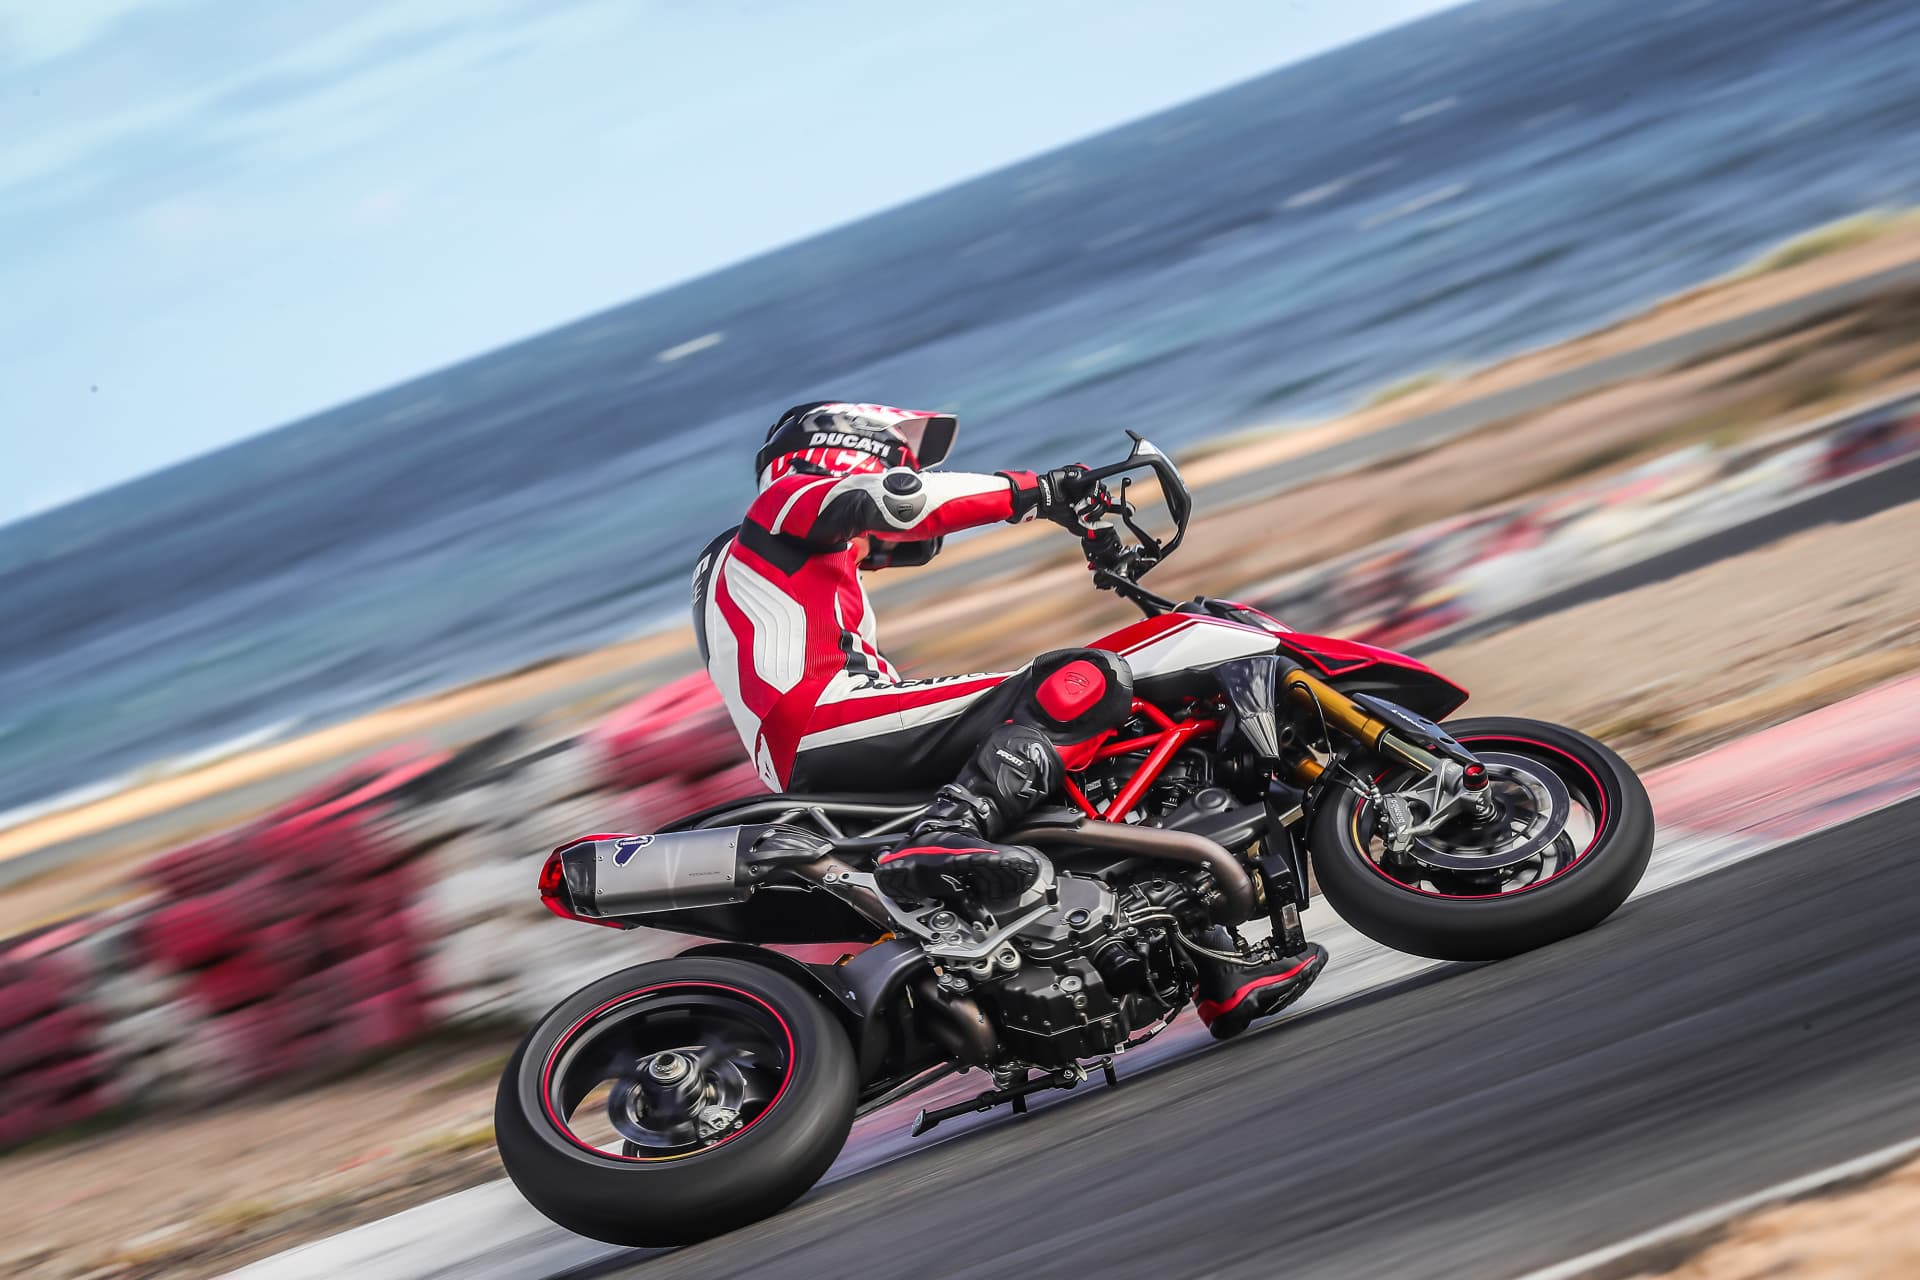 Ducati Hypermotard 950 Sp Performance 09 Uc70337 Mid